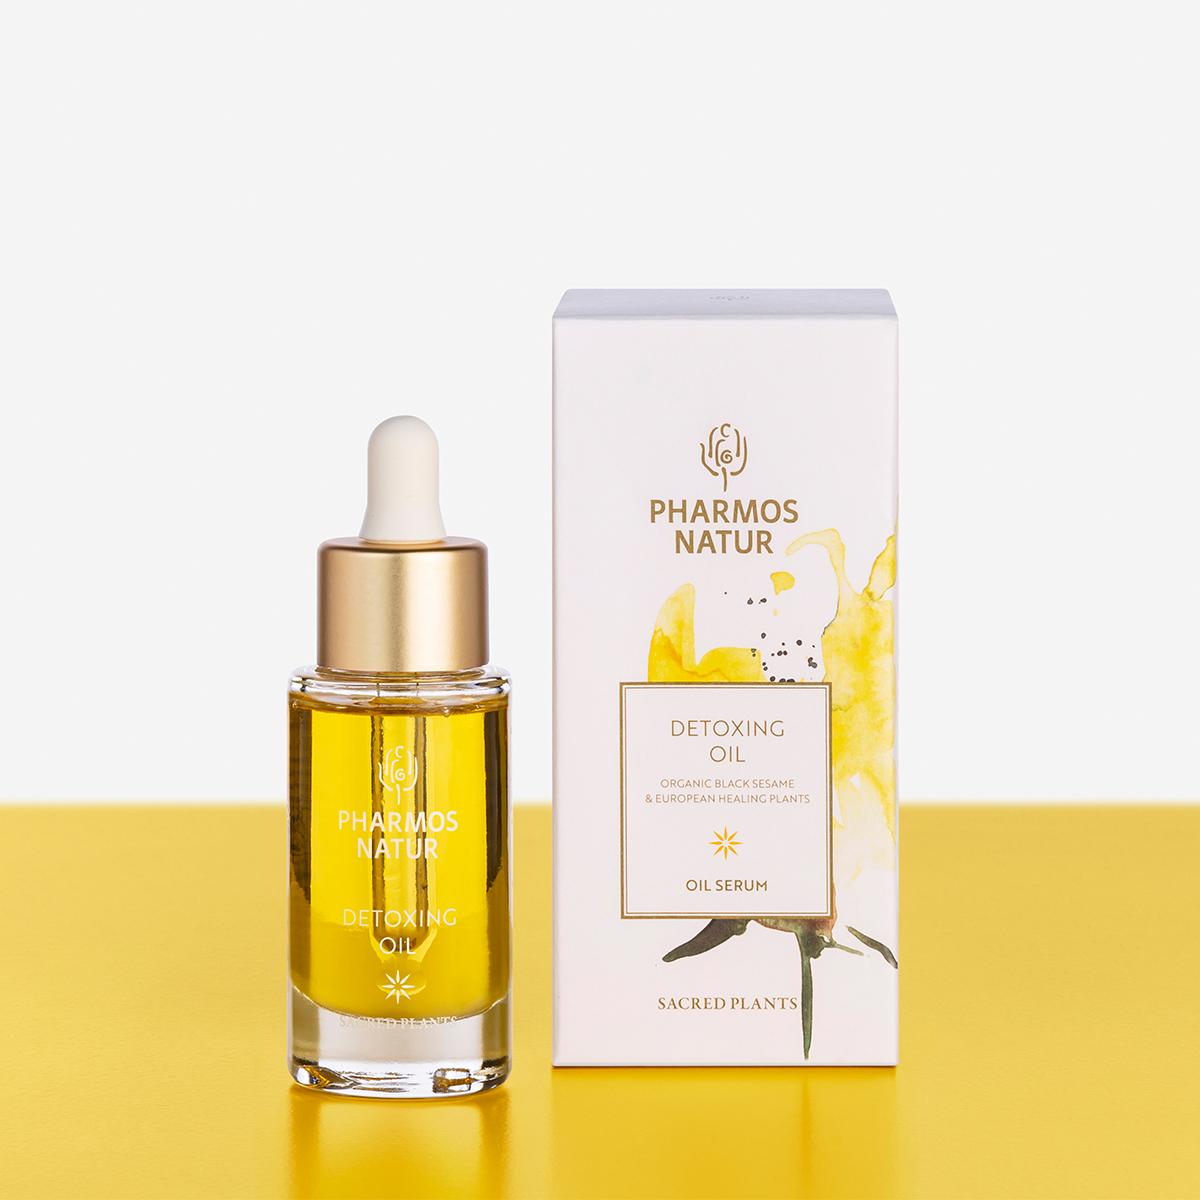 Gelbes Detoxing Oil Produktbild